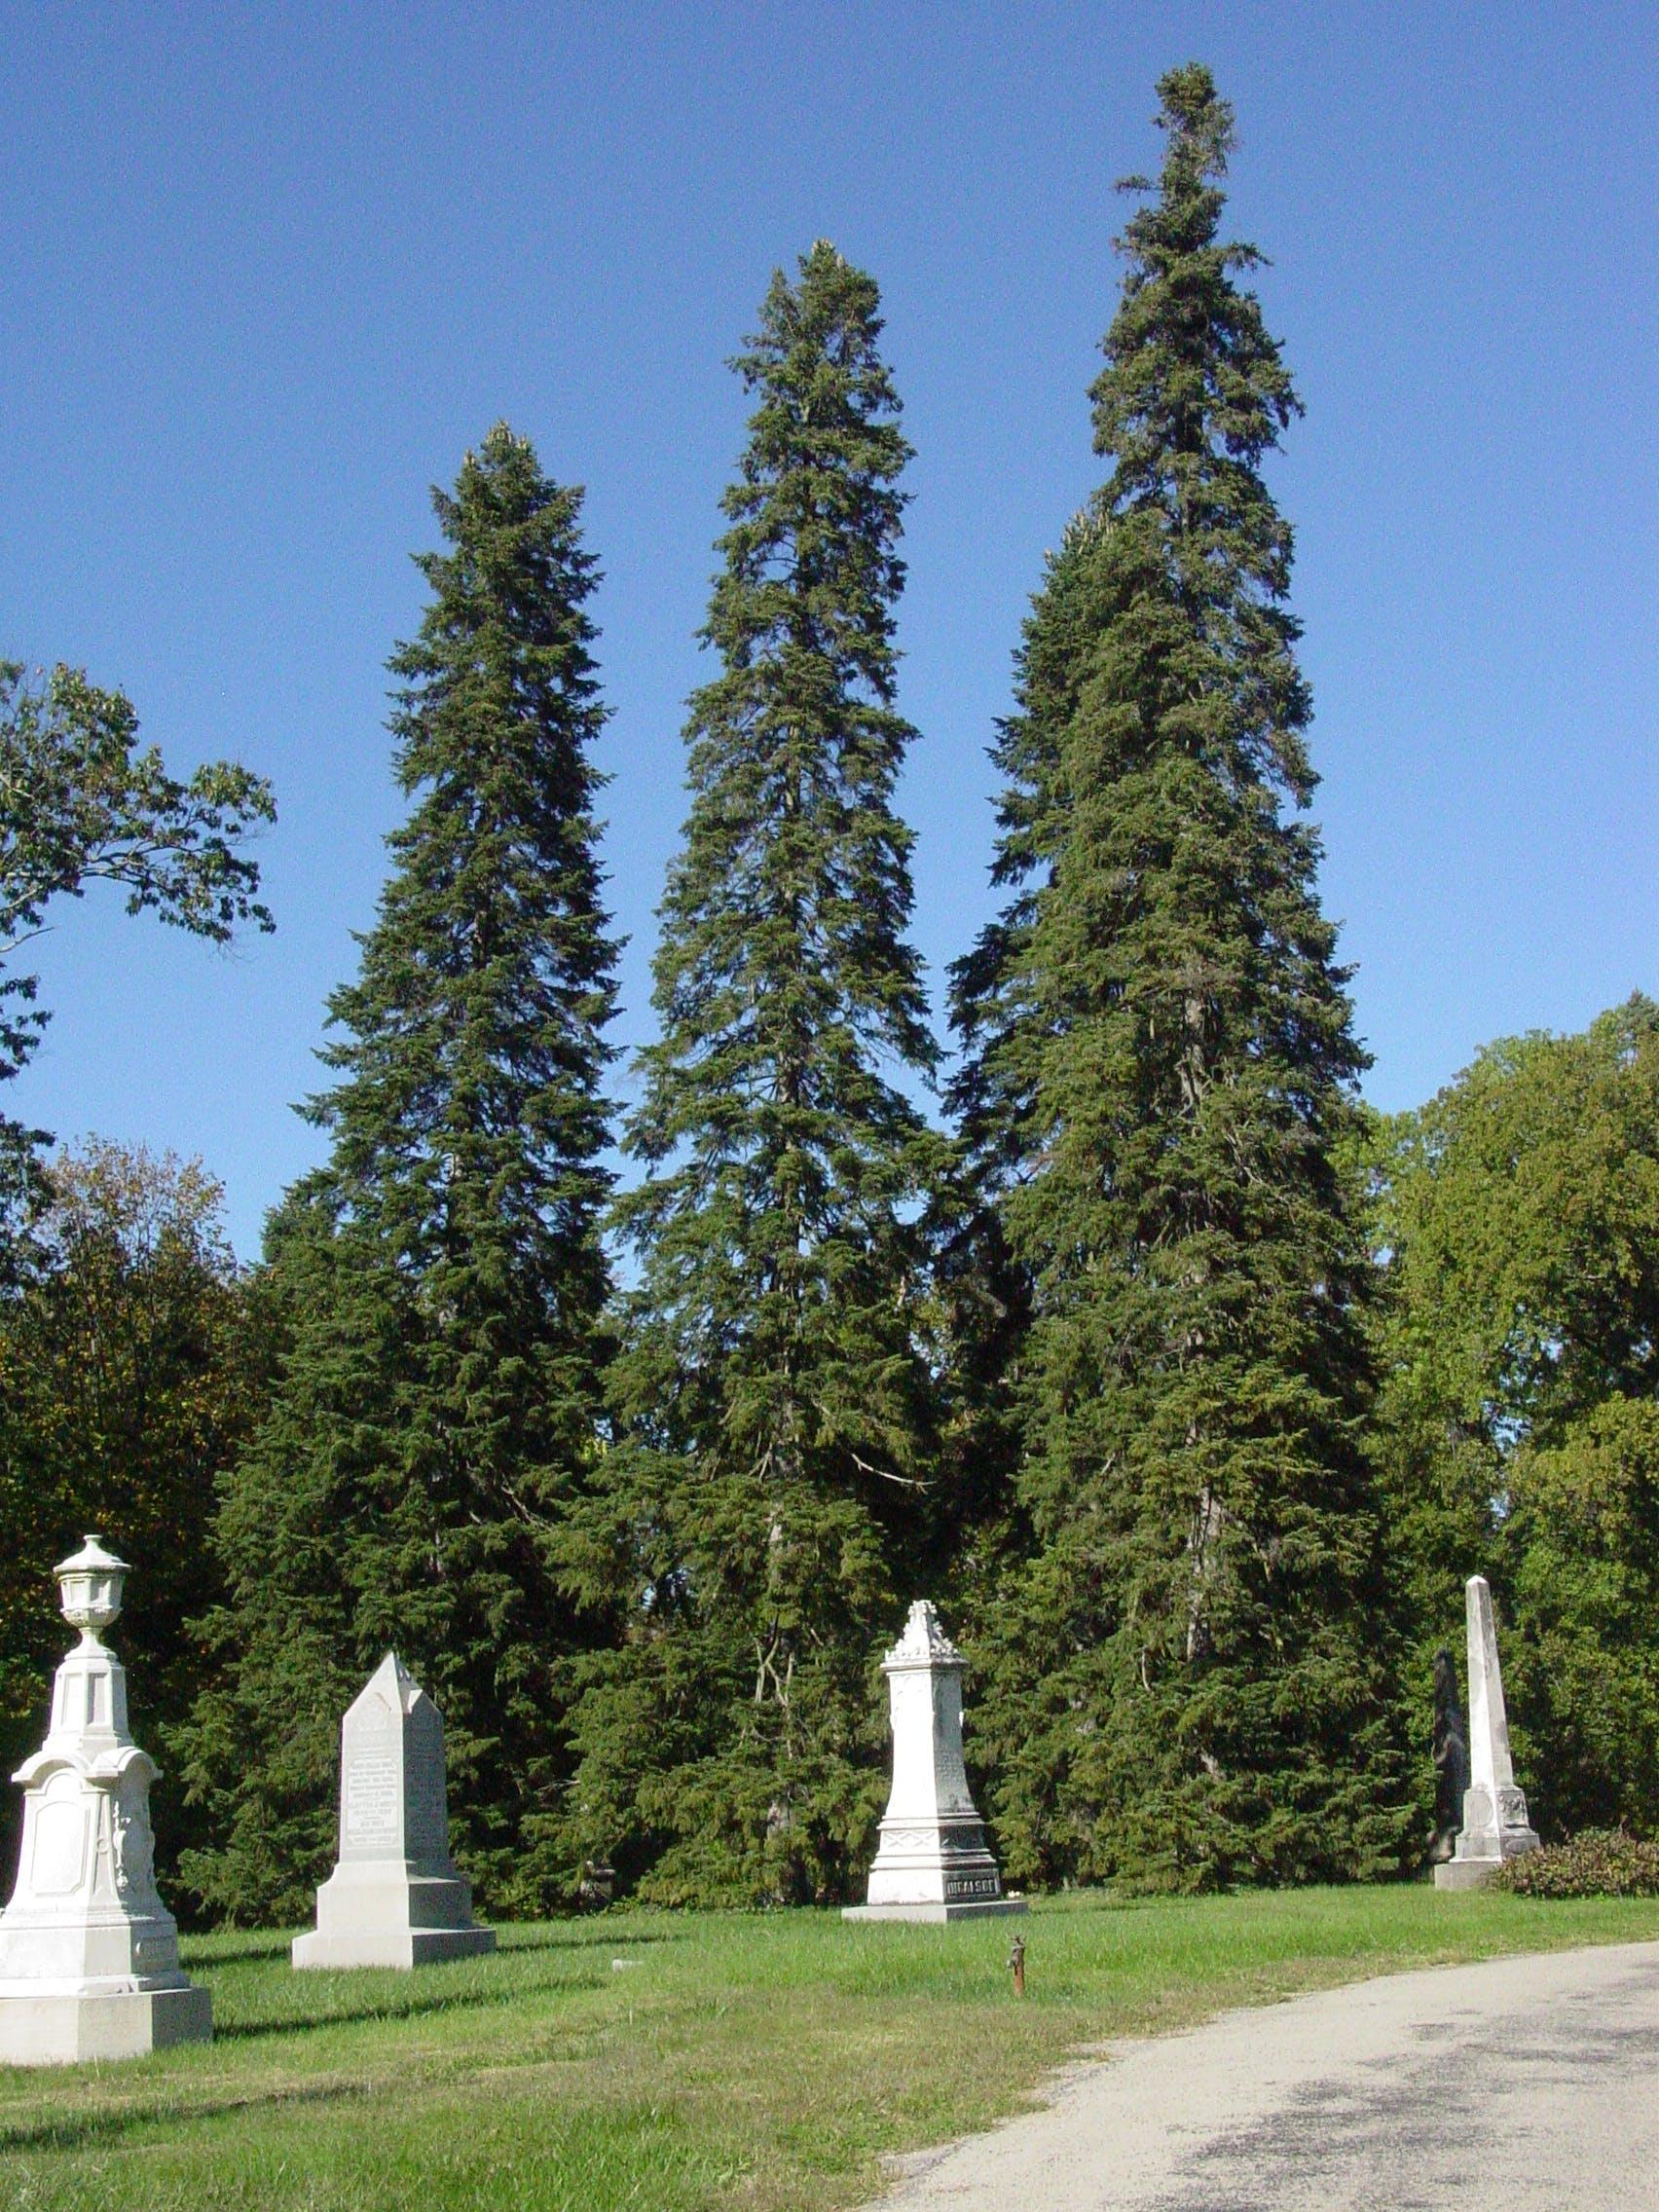 Cilicician fir